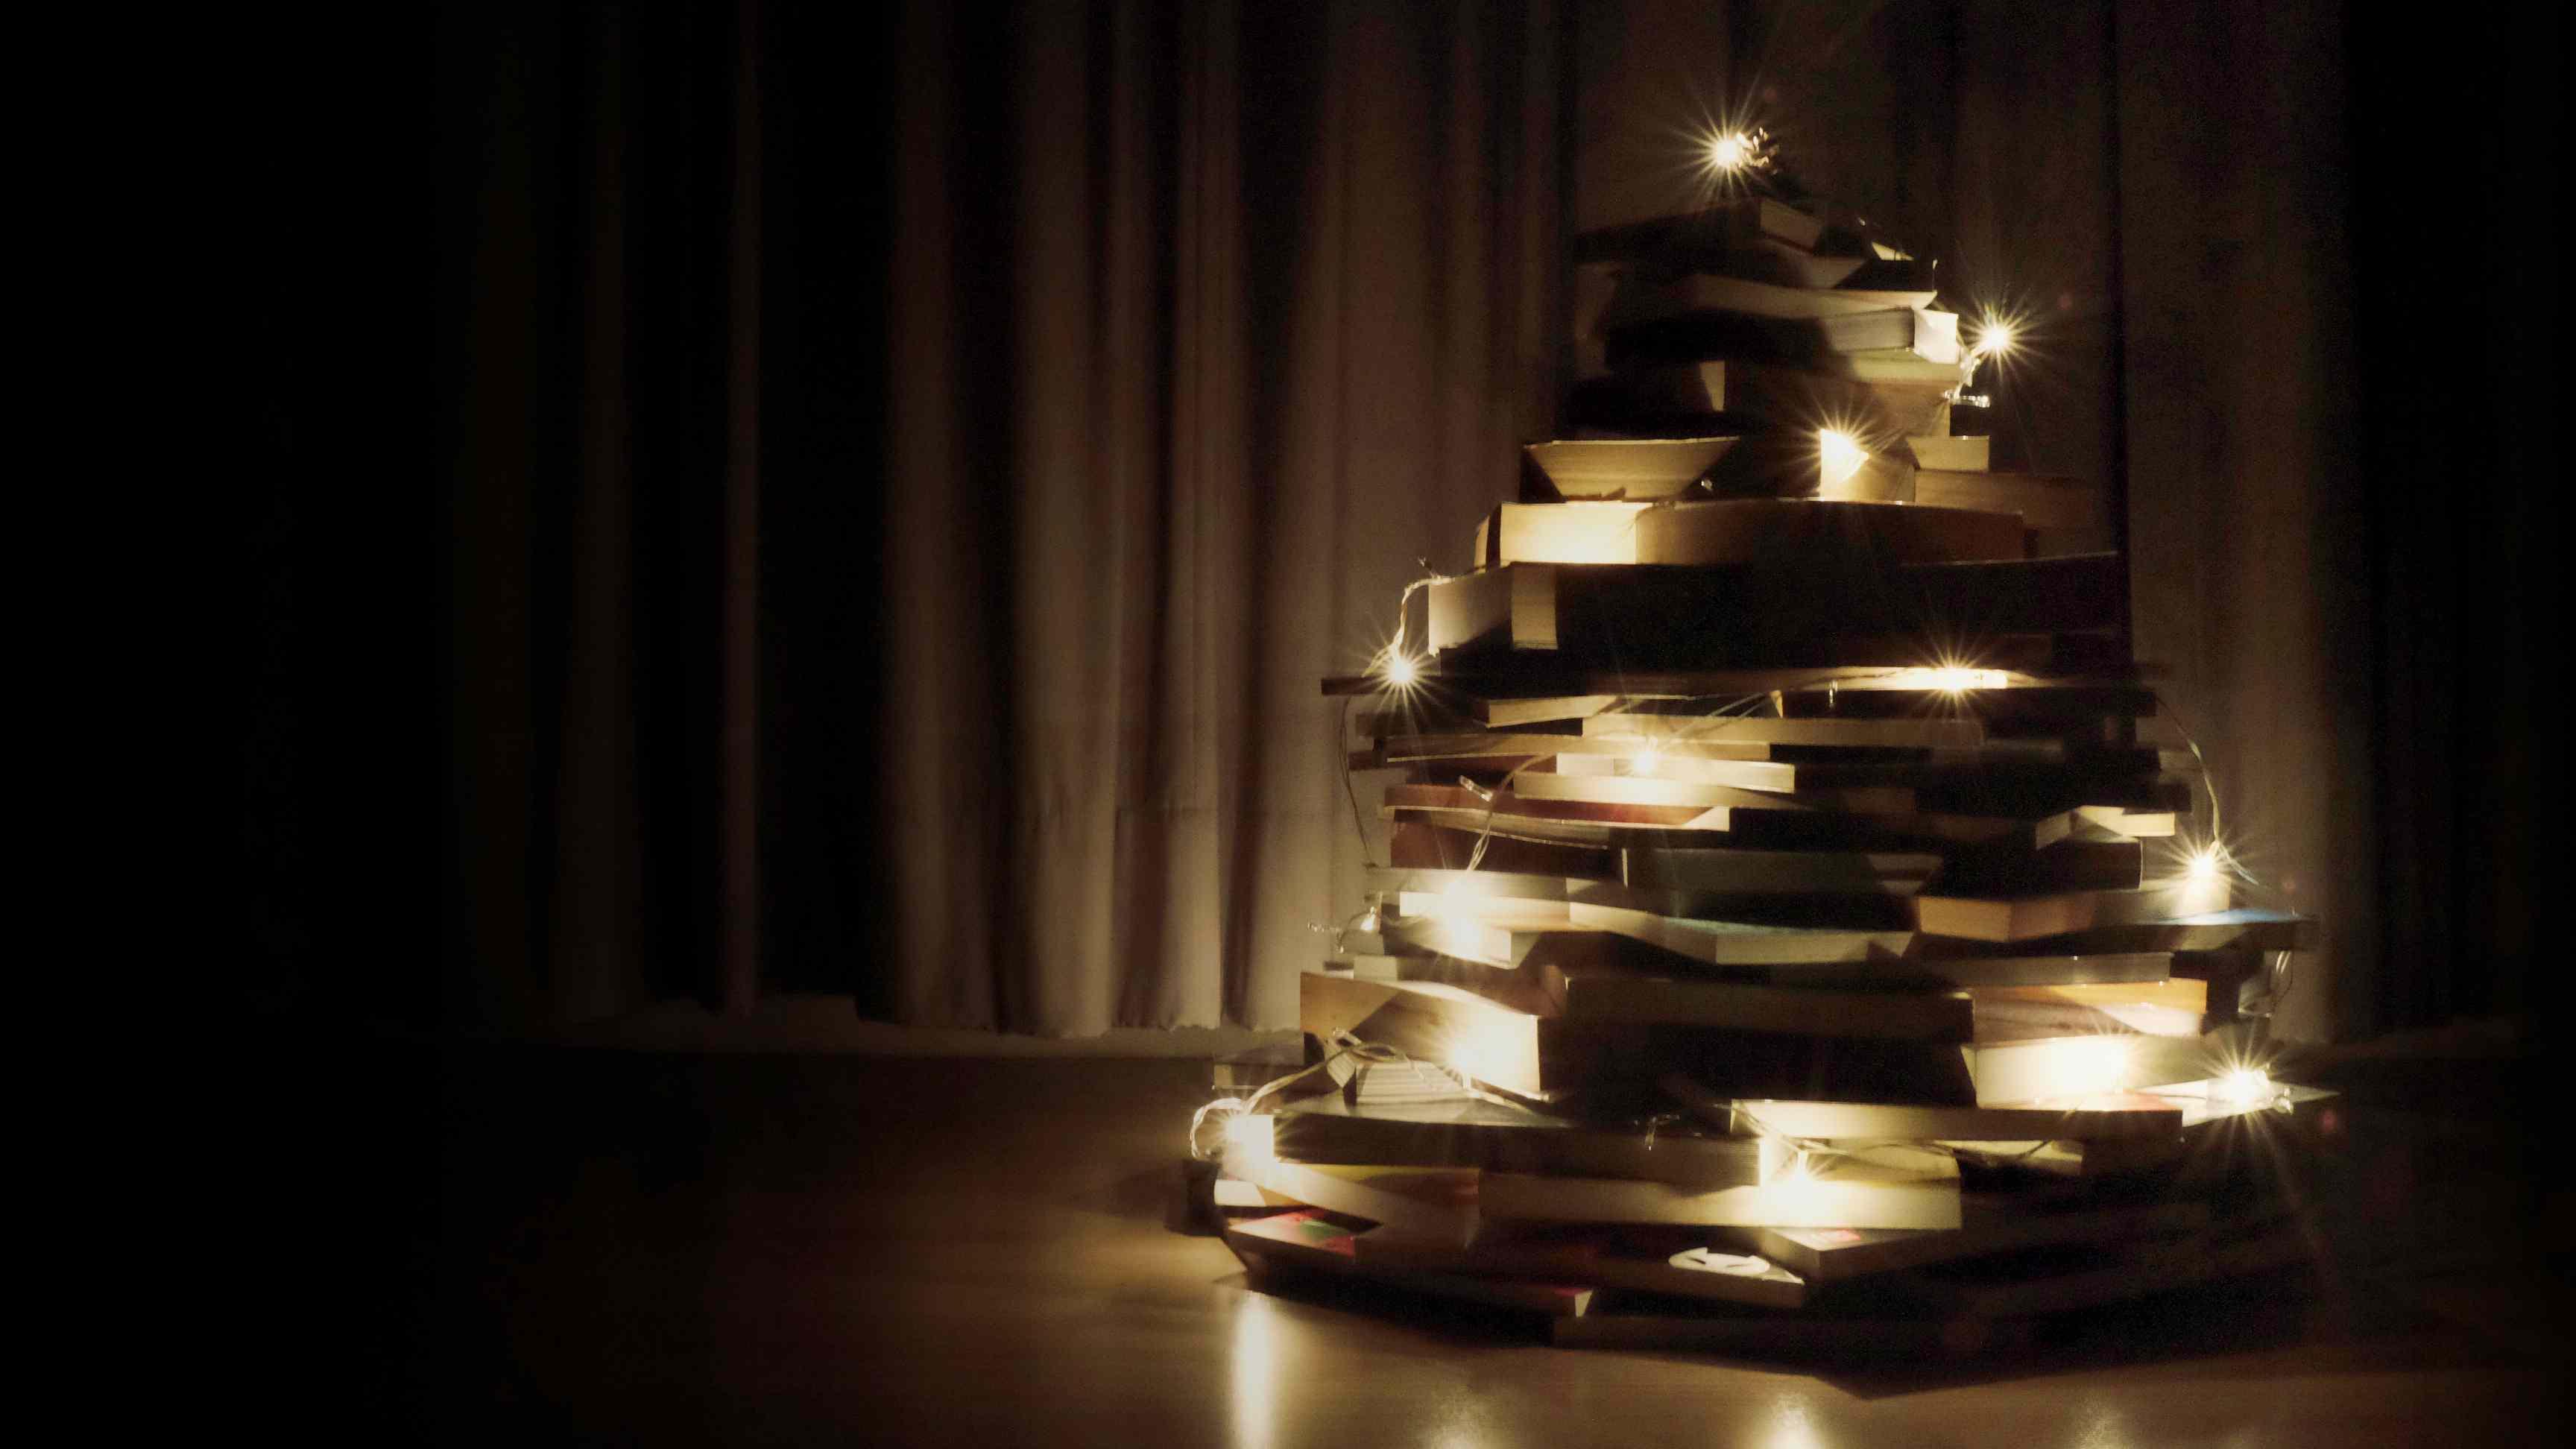 small Christmas tree made of books and lights